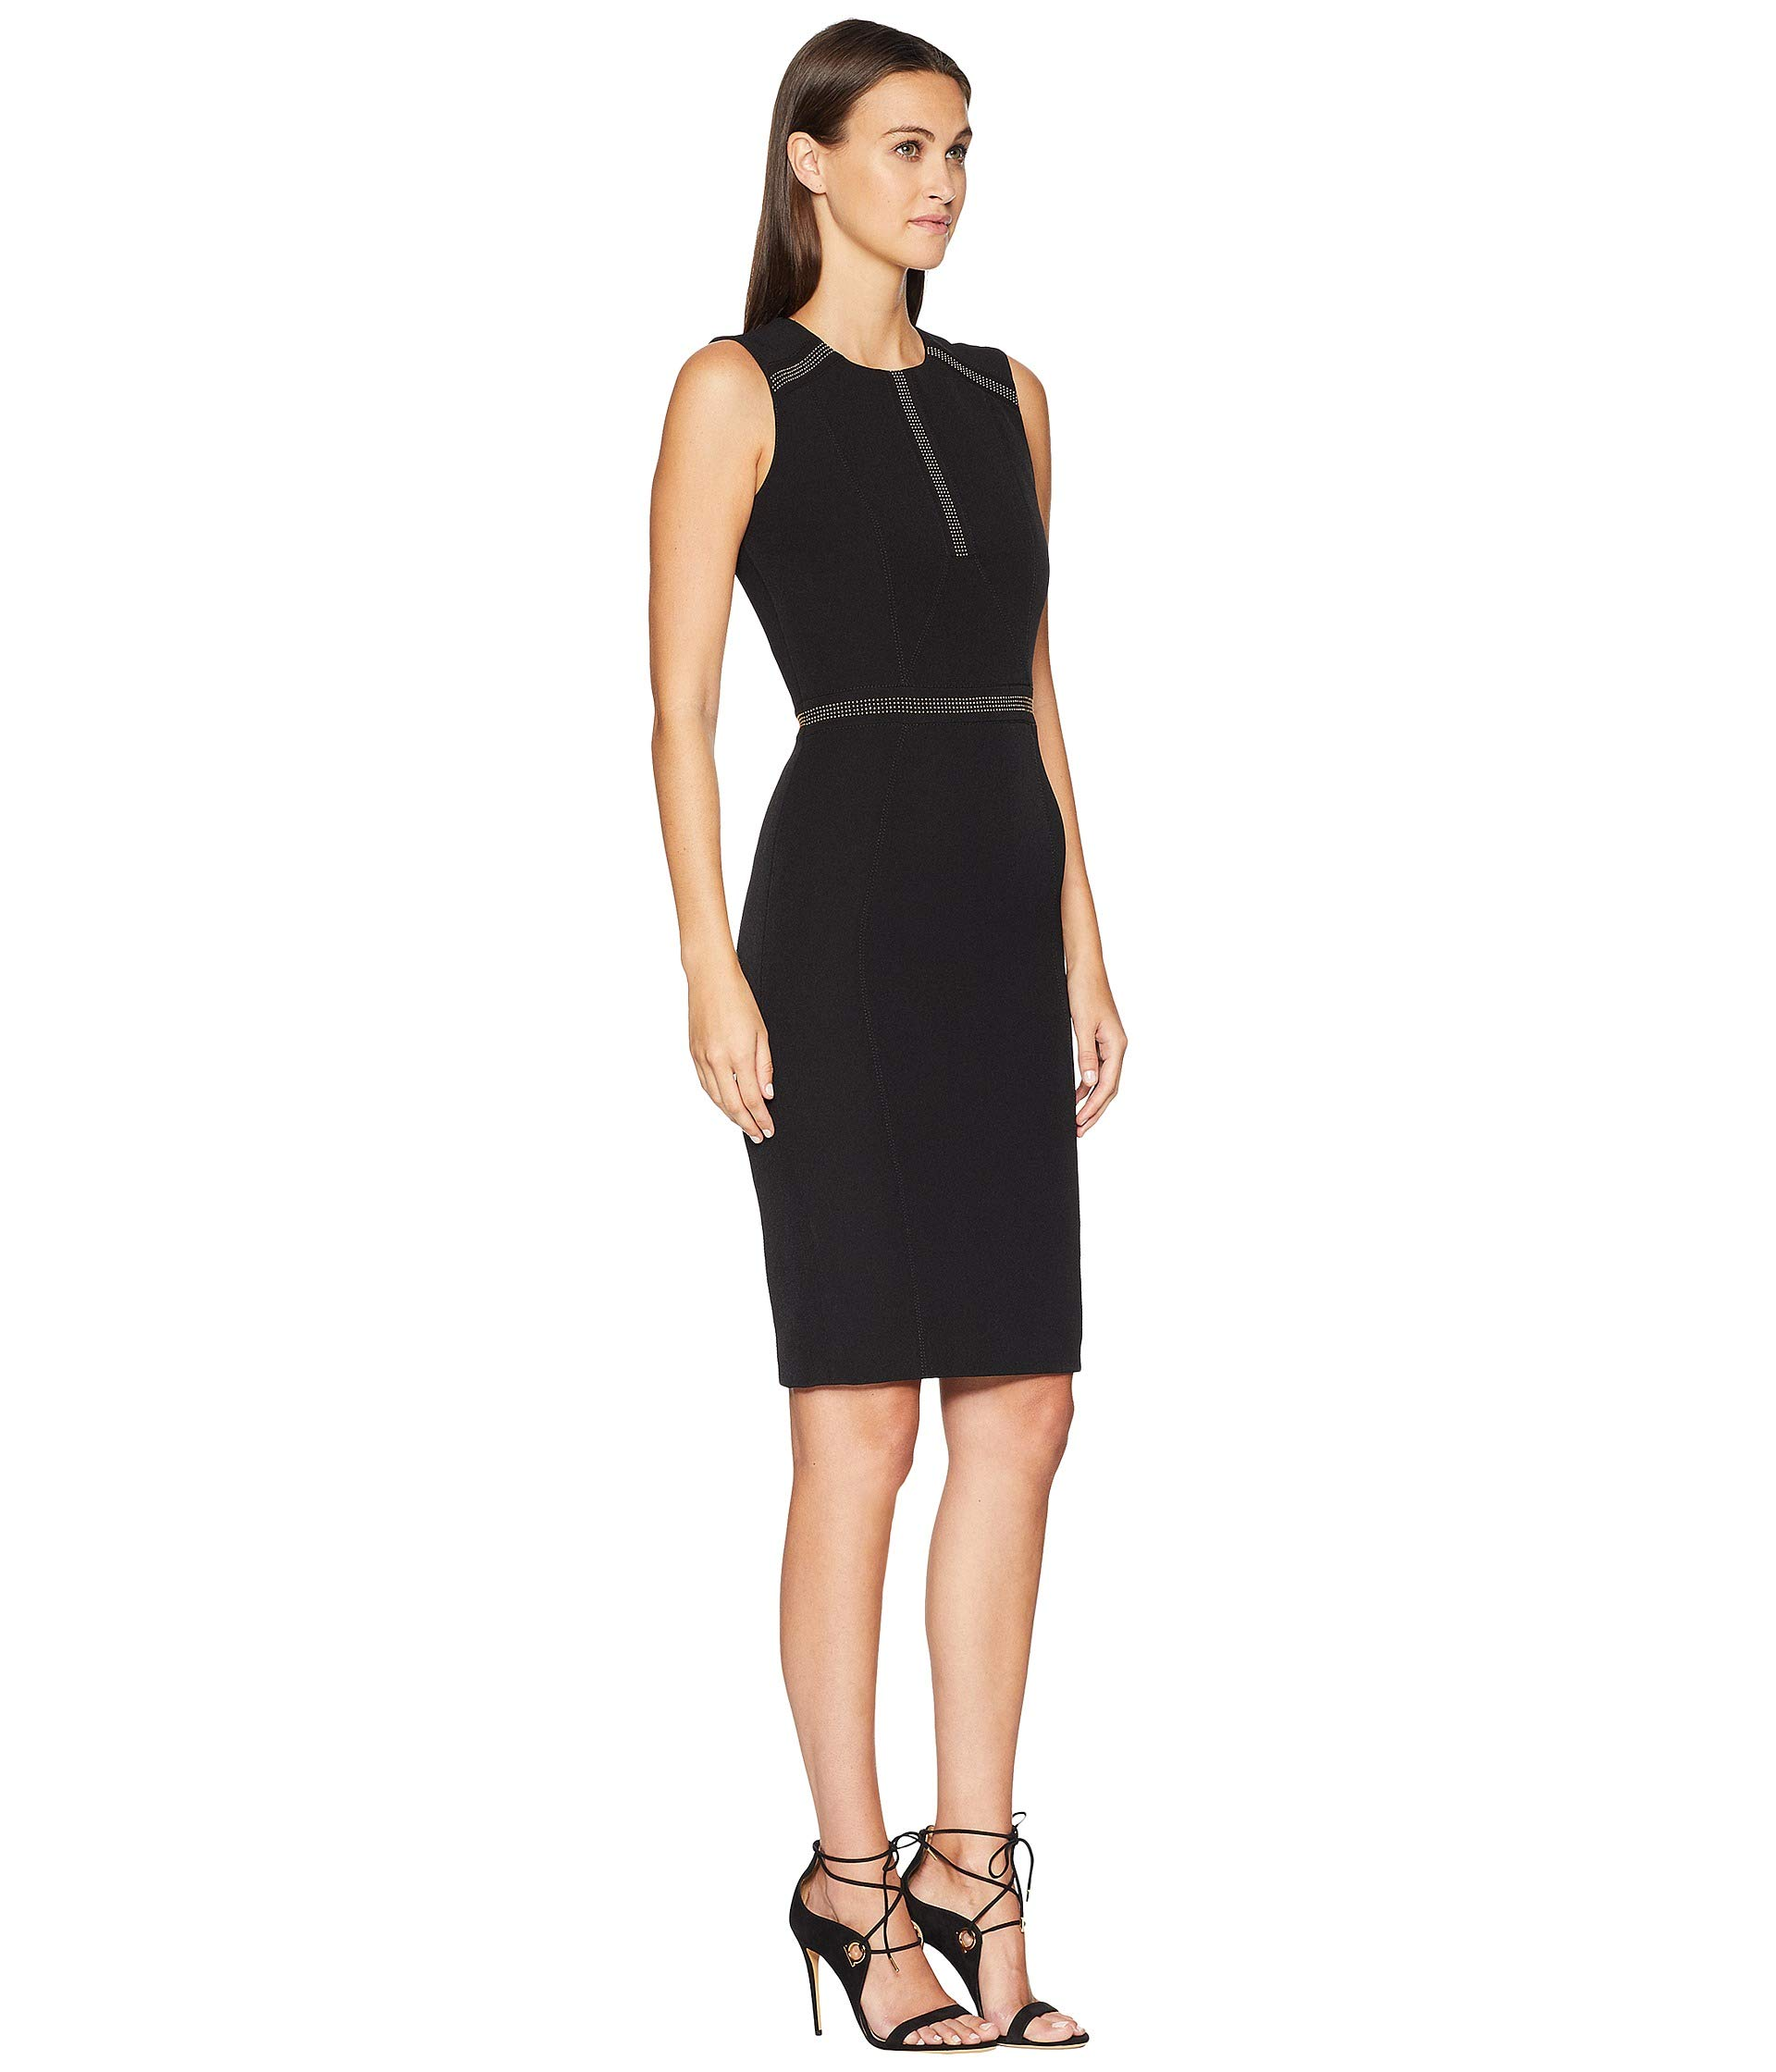 Tessuto Donna Versace Abito Collection At BrCxdoeW